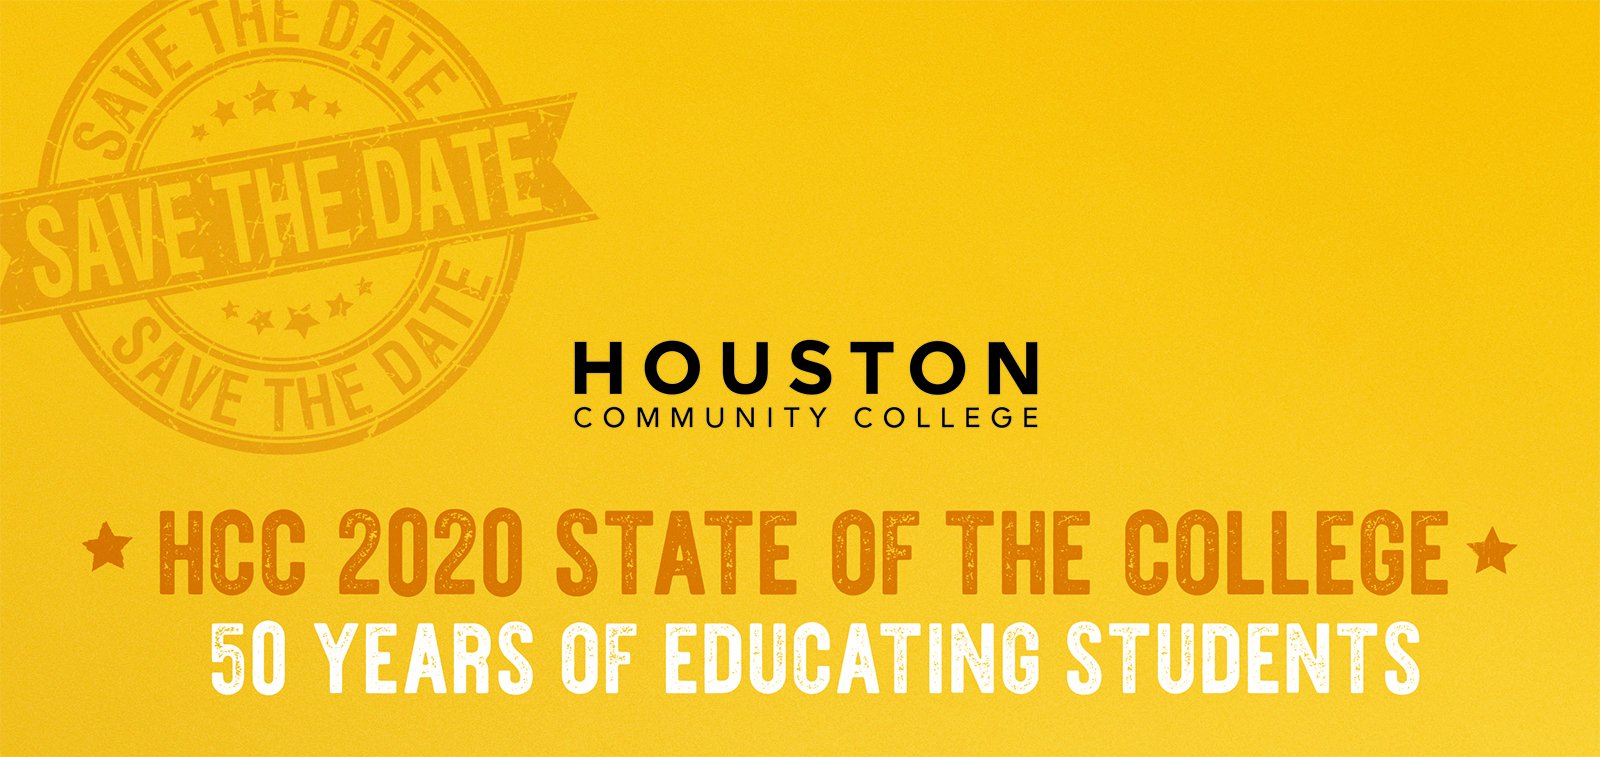 Houston Community College | Hcc For Houston Communiry College Calender